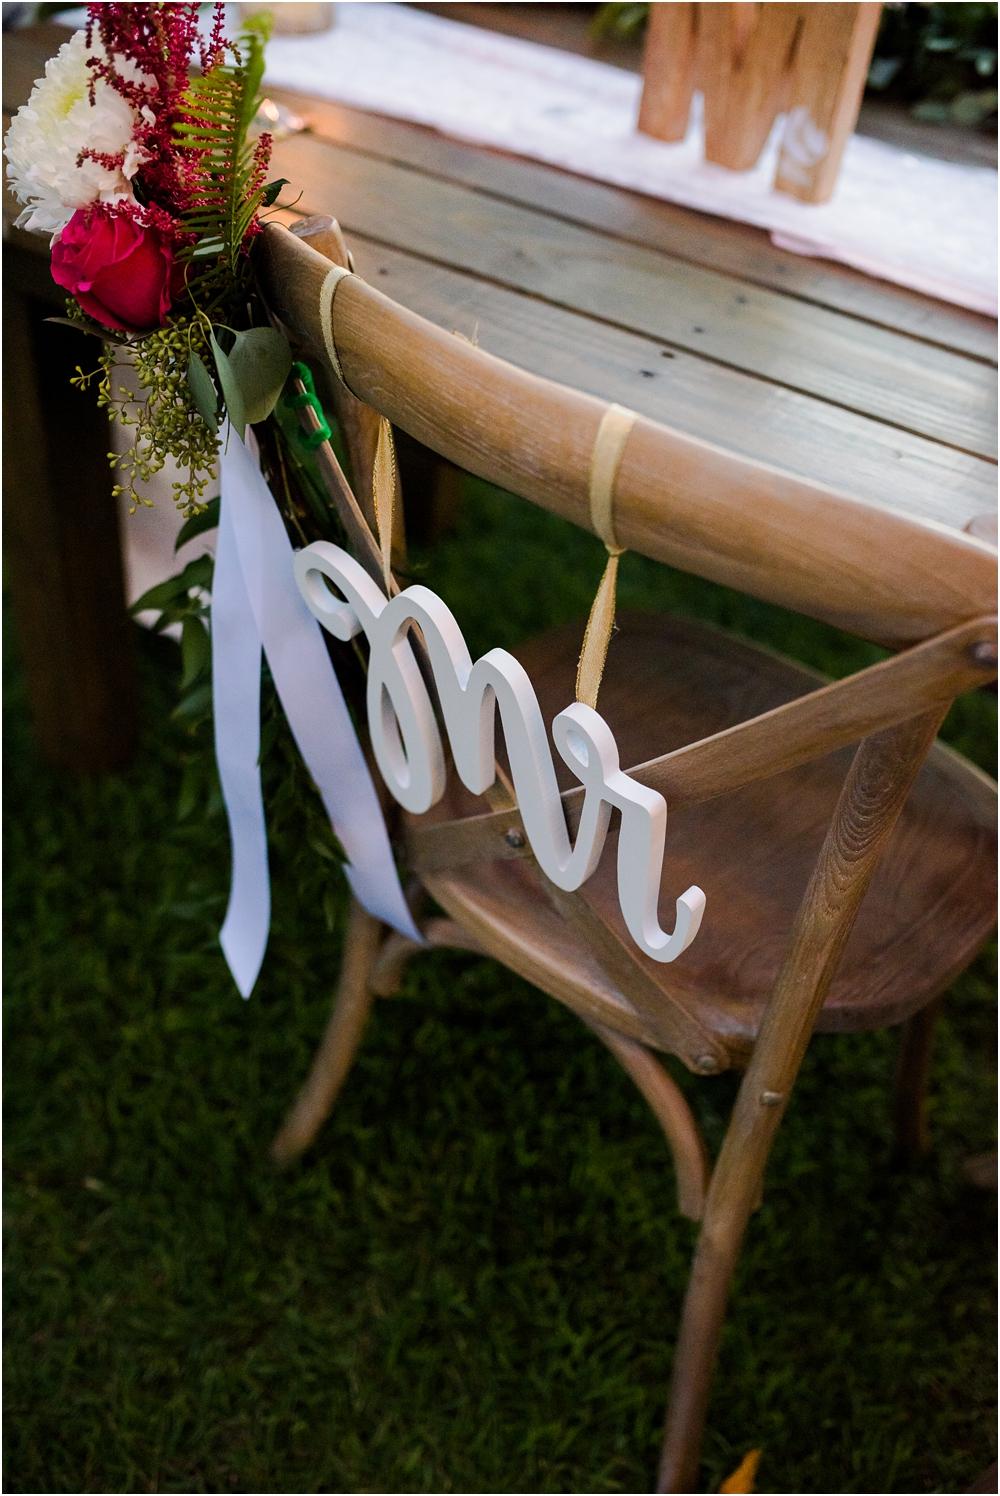 mcglothlin-wedding-kiersten-stevenson-photography-30a-panama-city-beach-dothan-tallahassee-(123-of-145).jpg